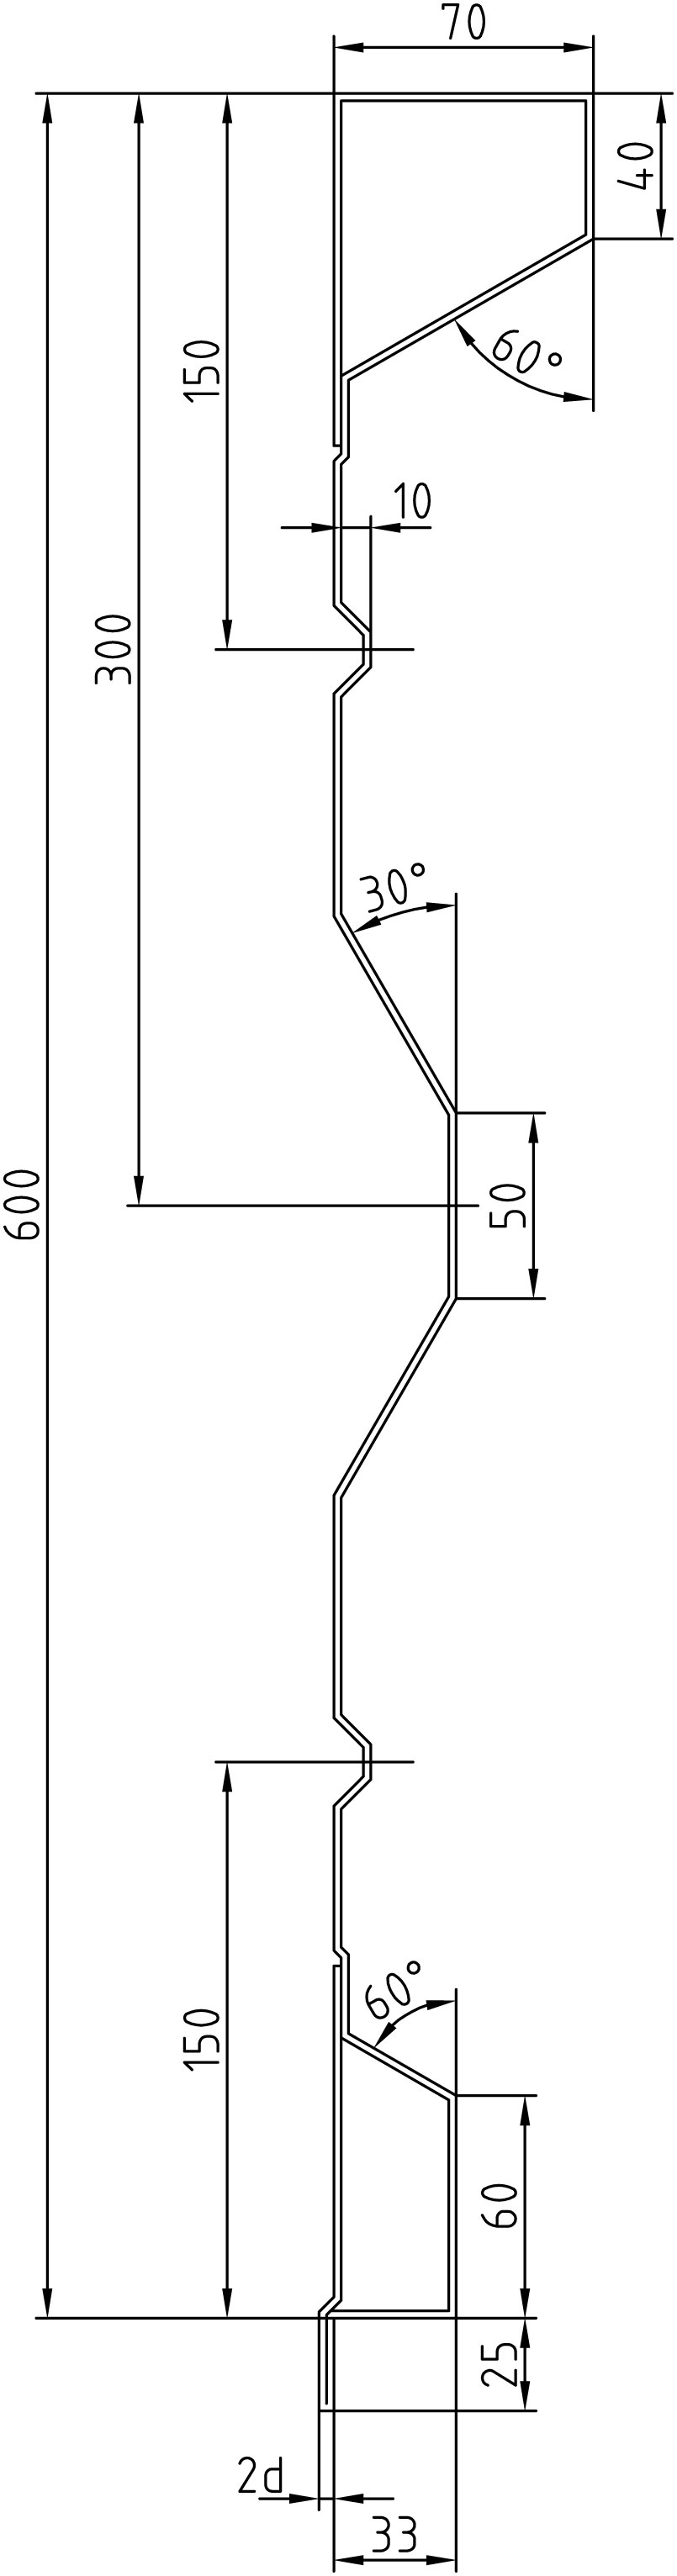 Brantner Kipper und Anhänger - 600x2x4059 AWS samt EL o. BW-Verb. o. PW-Bolzen